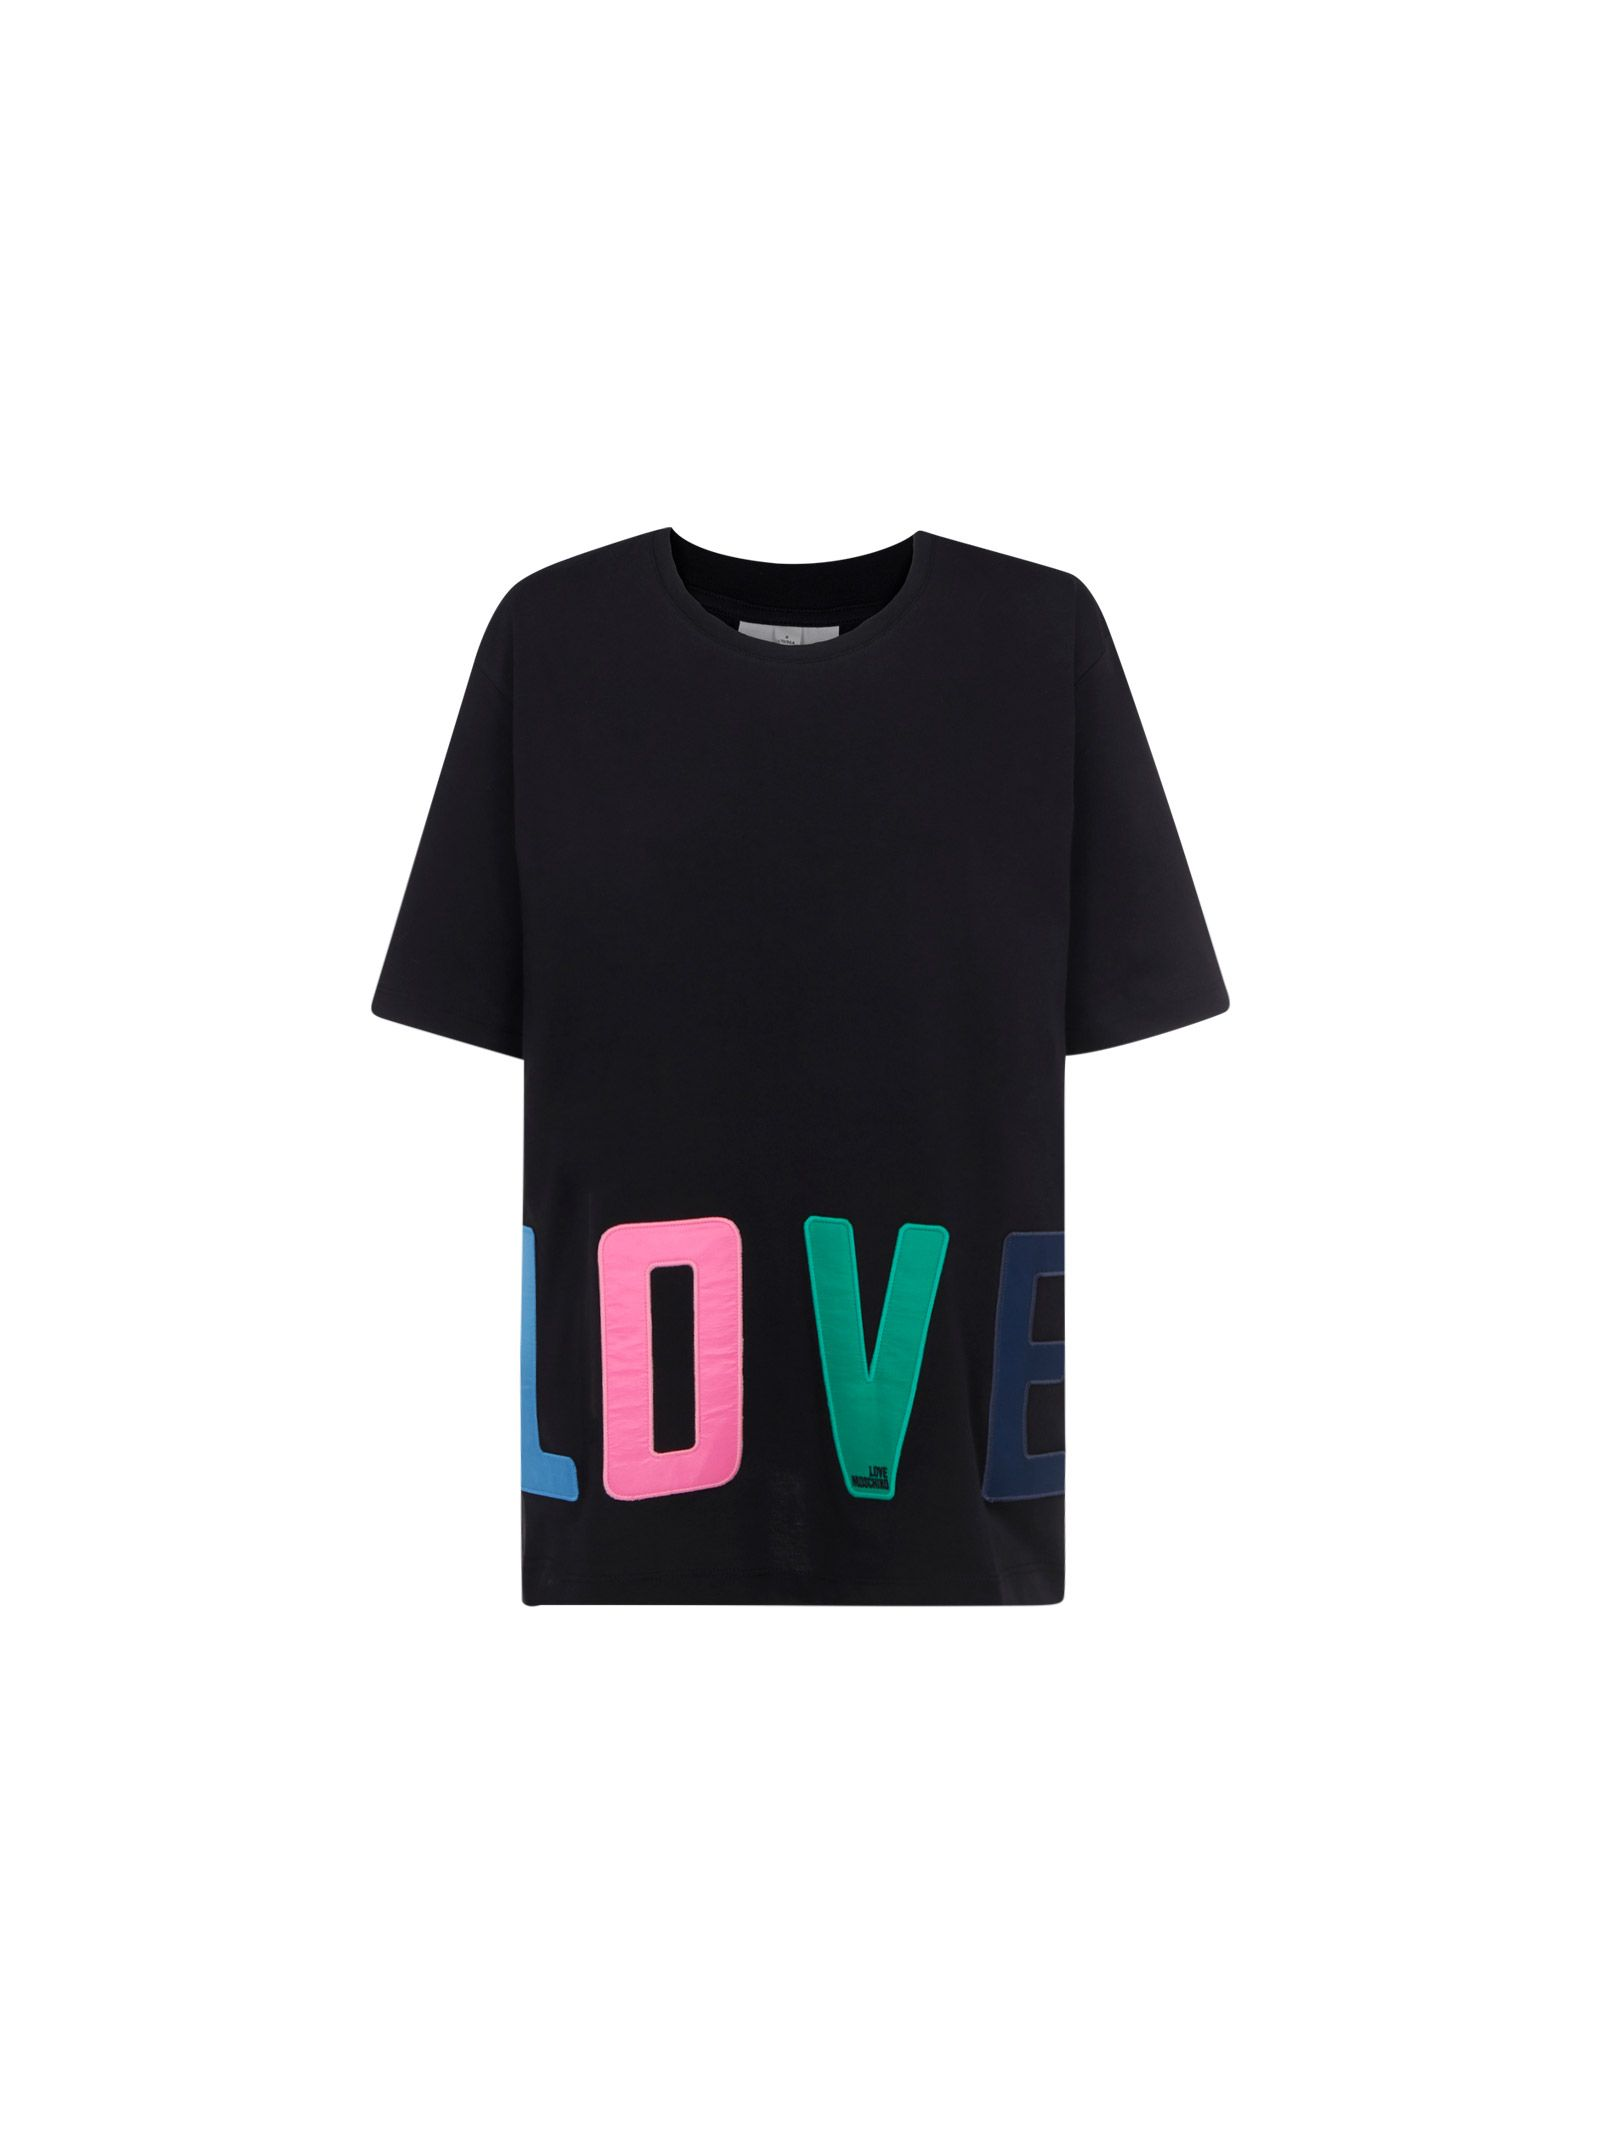 Love Moschino Cottons LOVE MOSCHINO WOMEN'S BLACK OTHER MATERIALS T-SHIRT